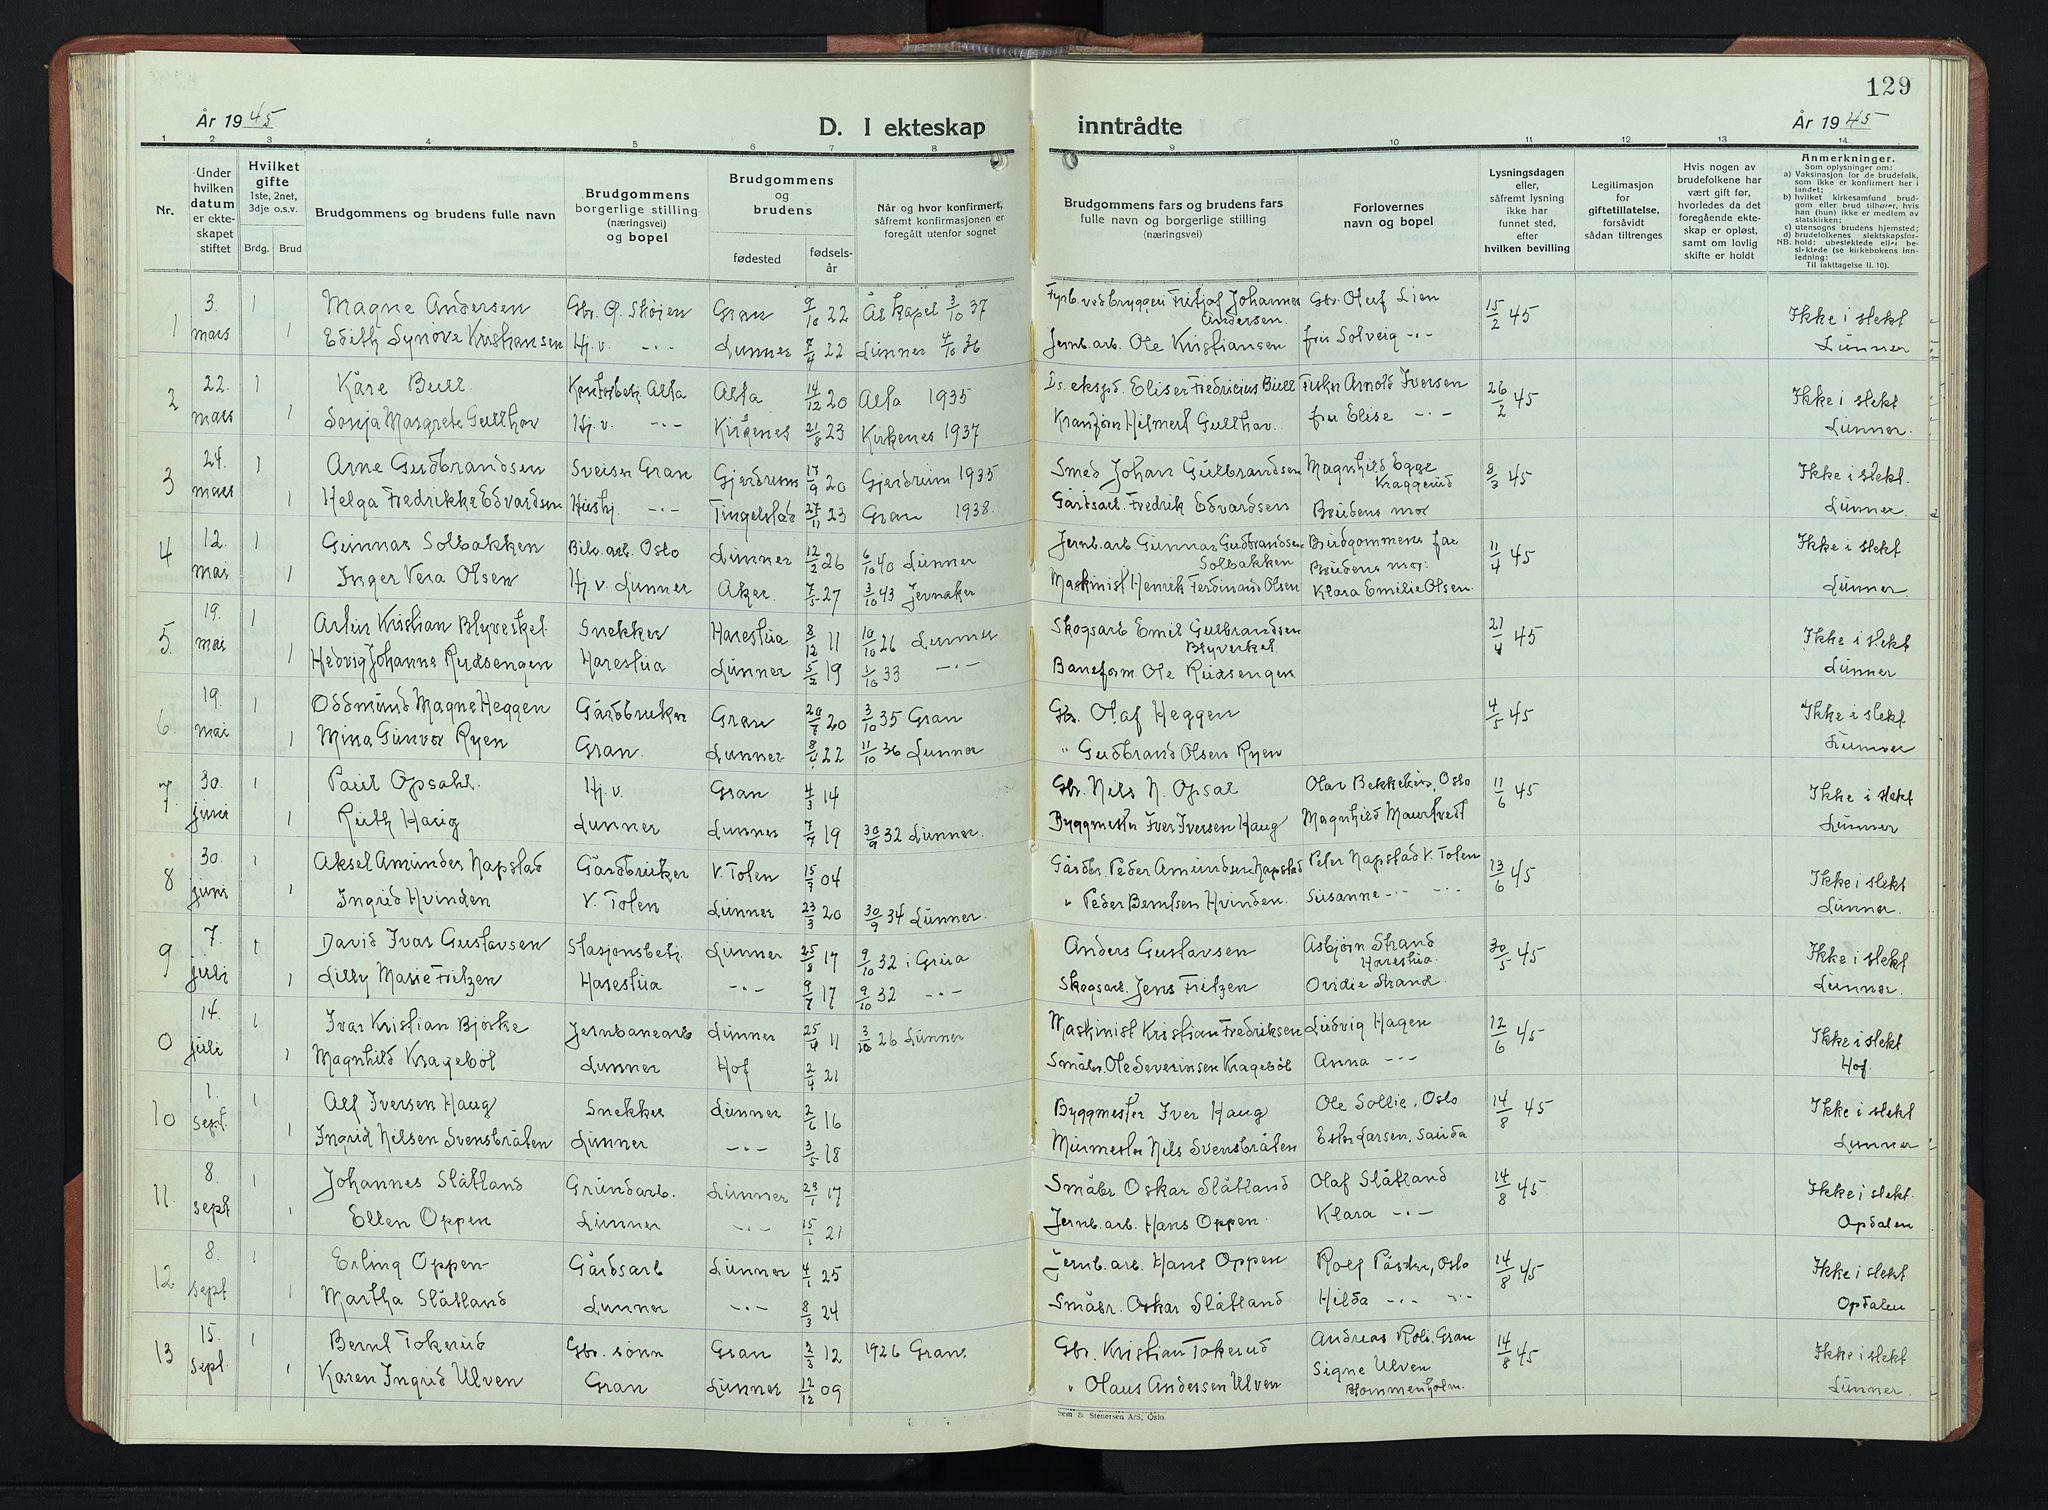 SAH, Lunner prestekontor, H/Ha/Hab/L0004: Klokkerbok nr. 4, 1943-1952, s. 129